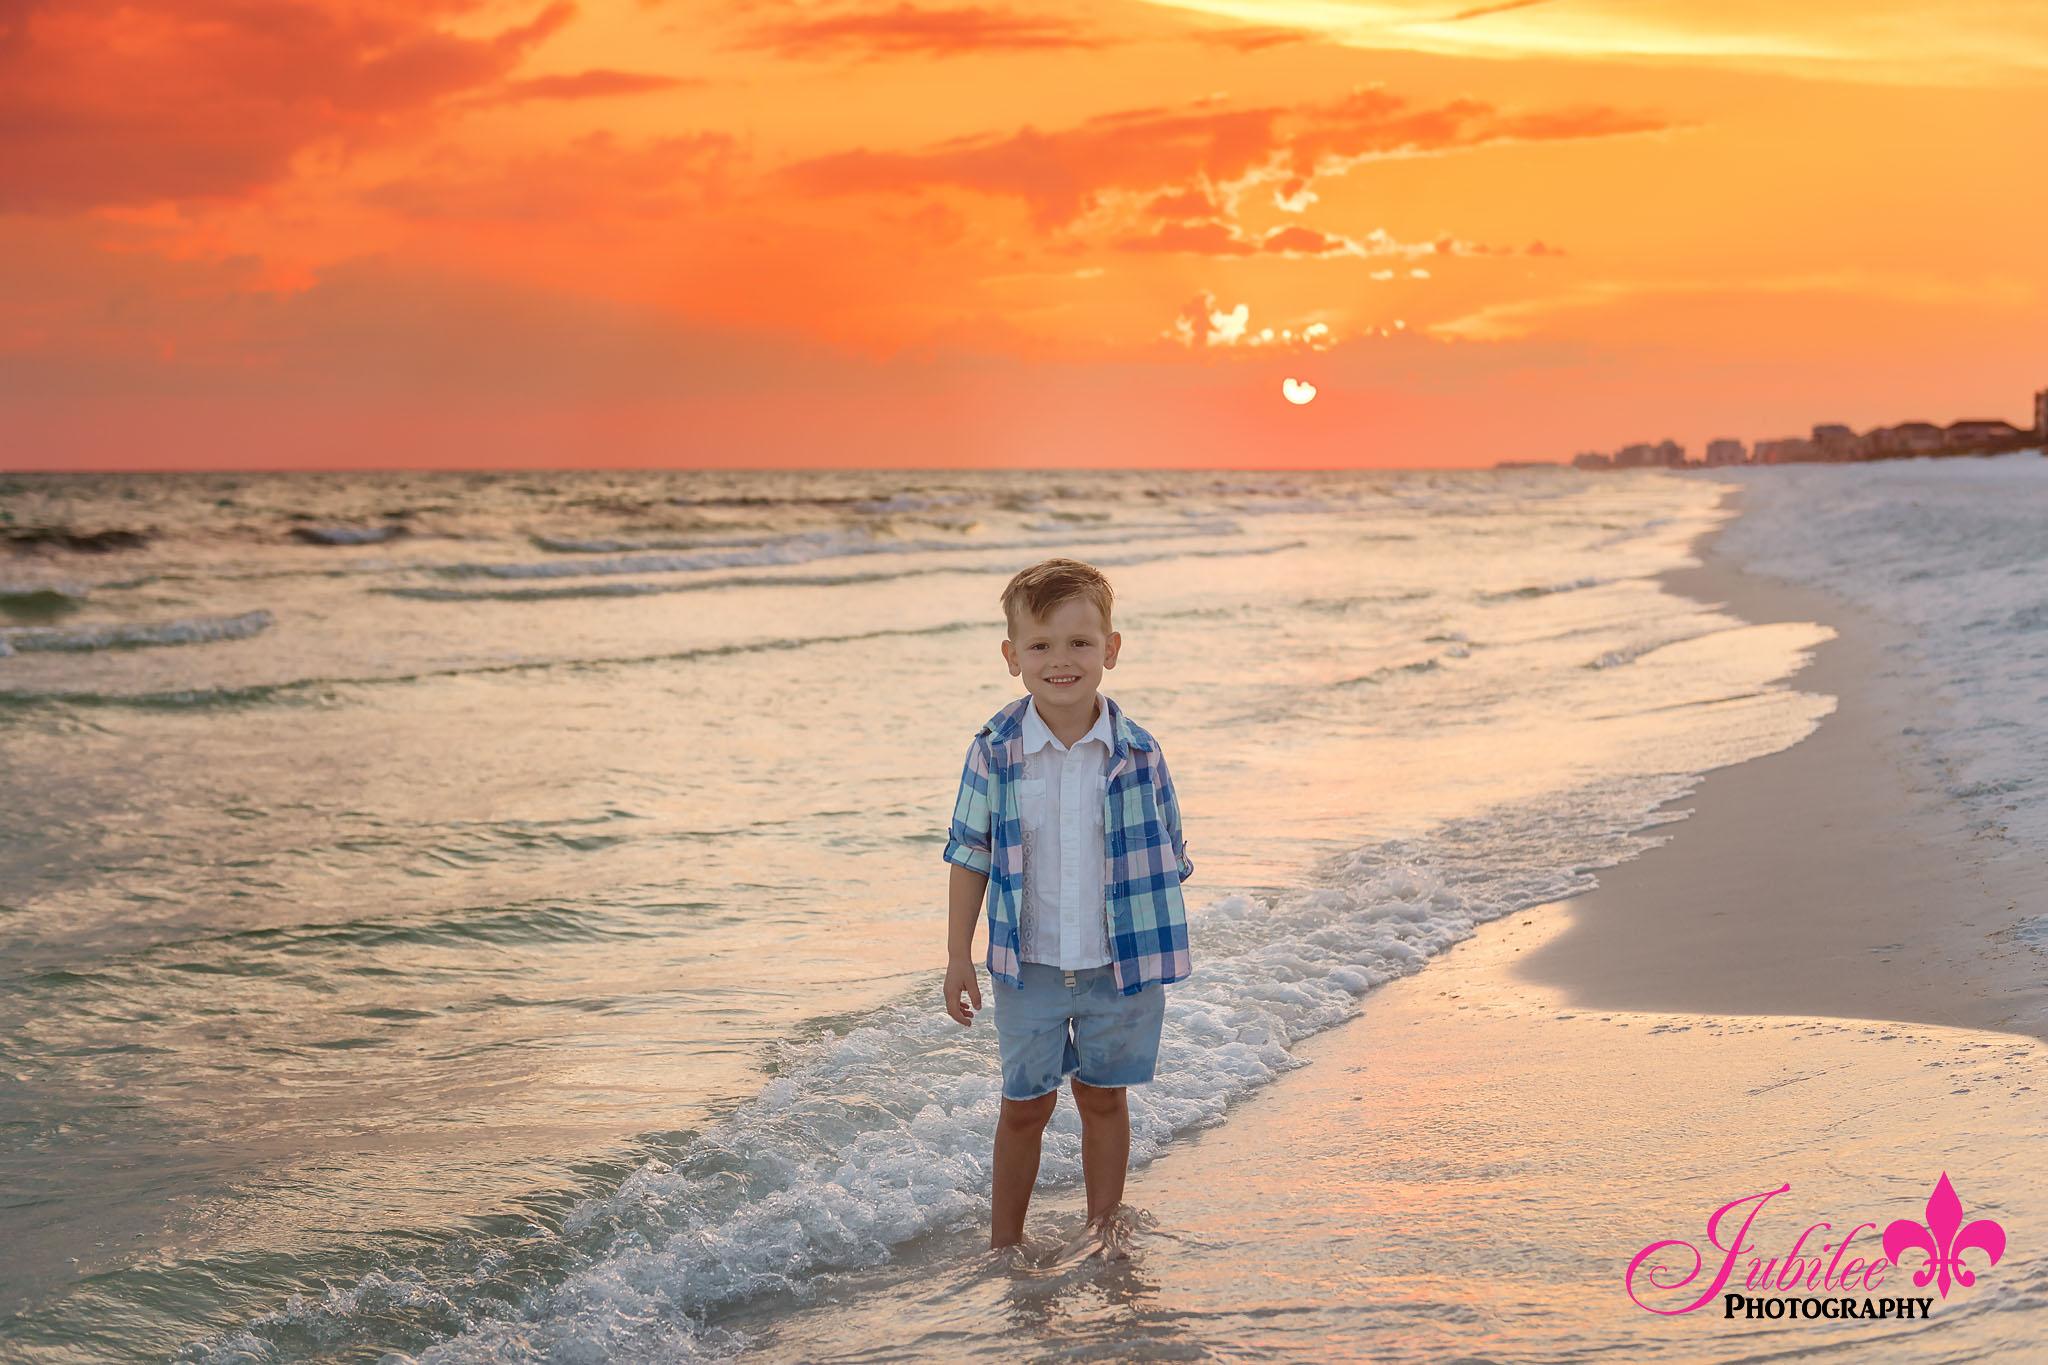 destin_beach_photographer_616